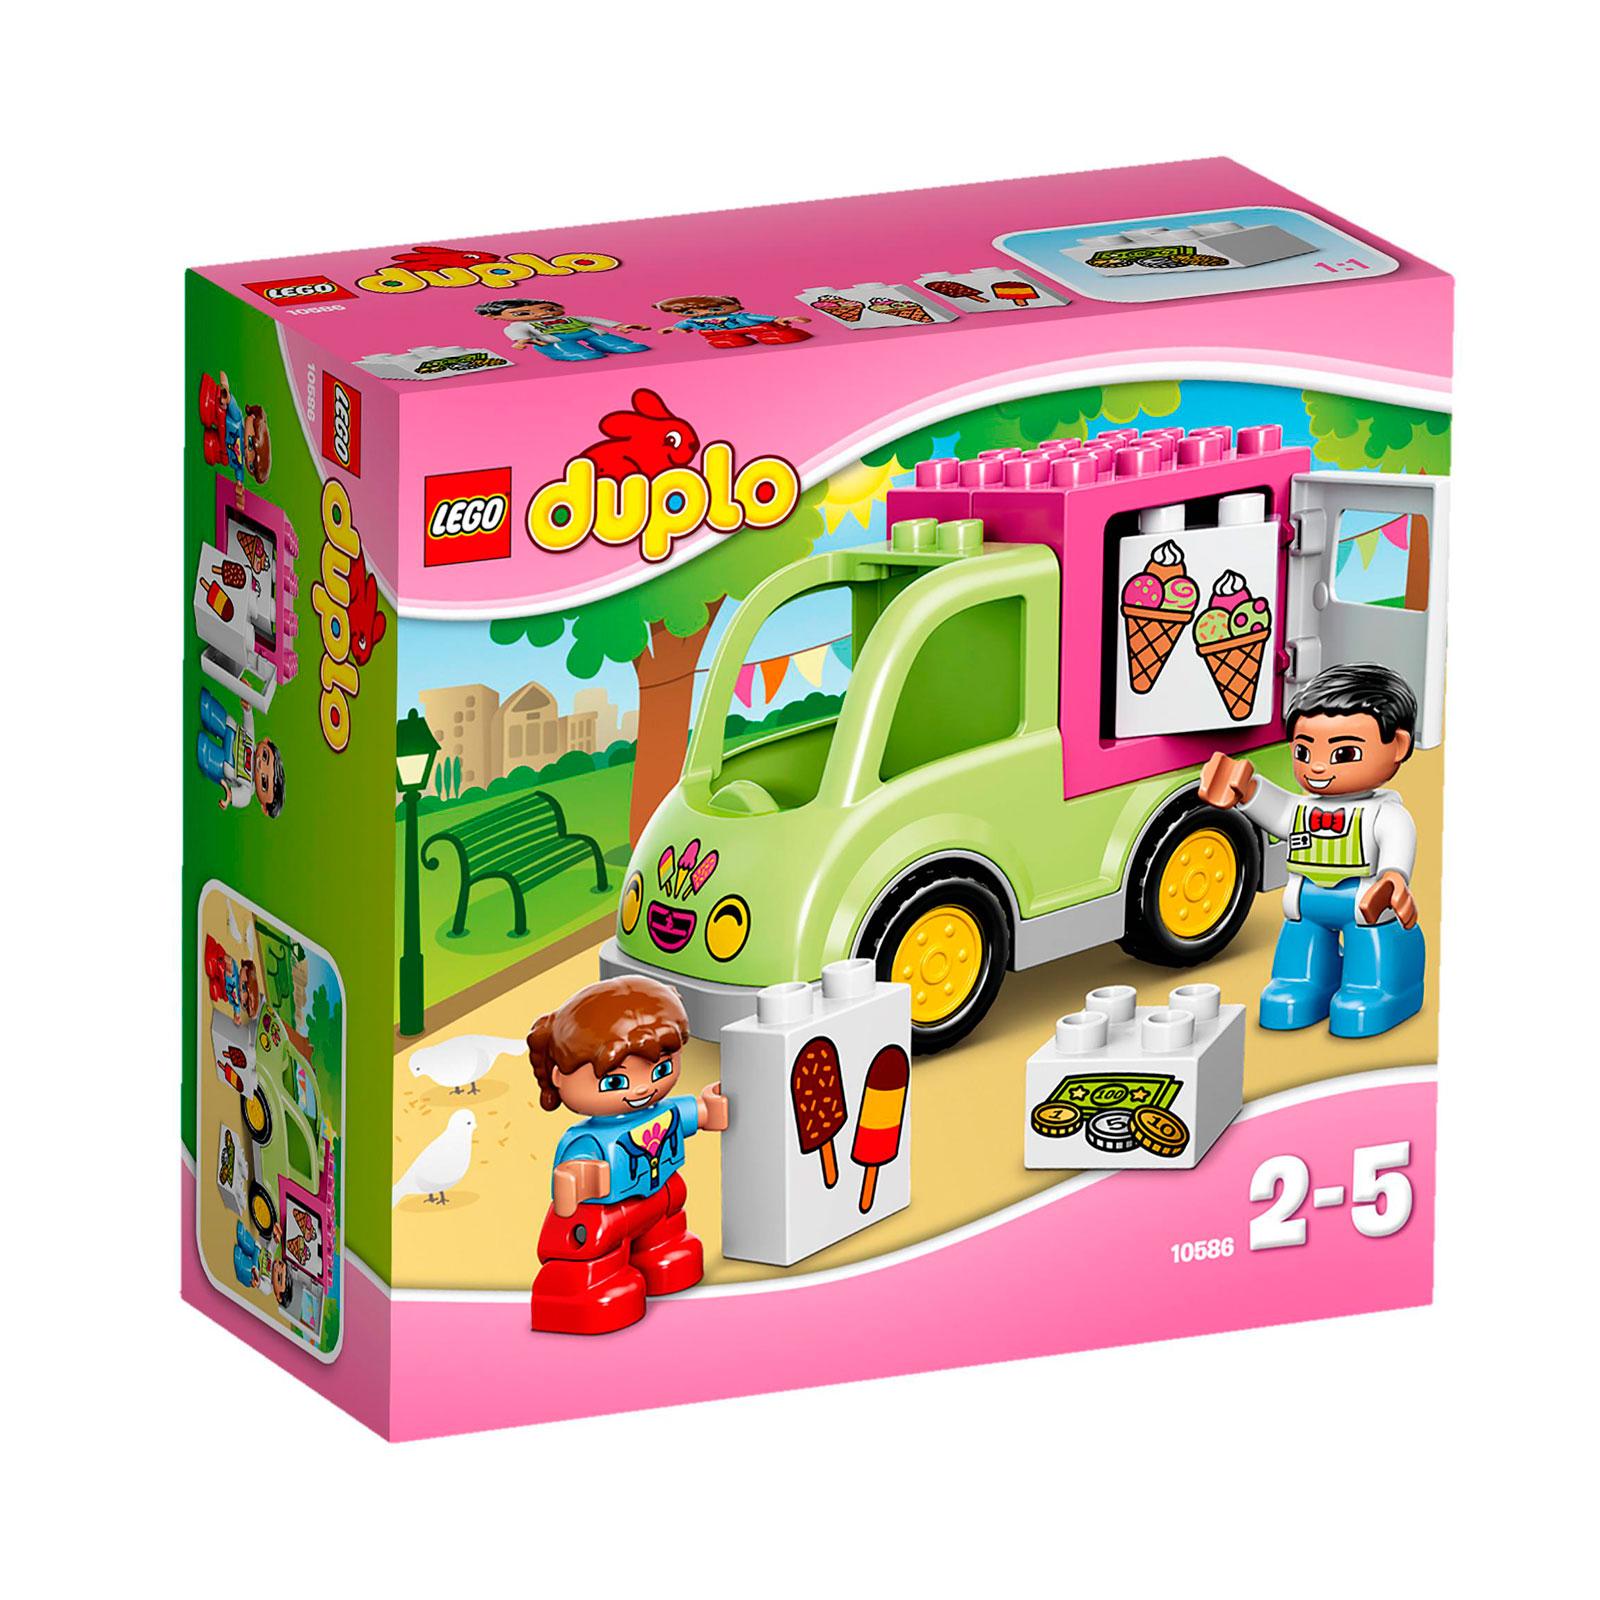 ����������� LEGO Duplo 10586 ������ � ���������